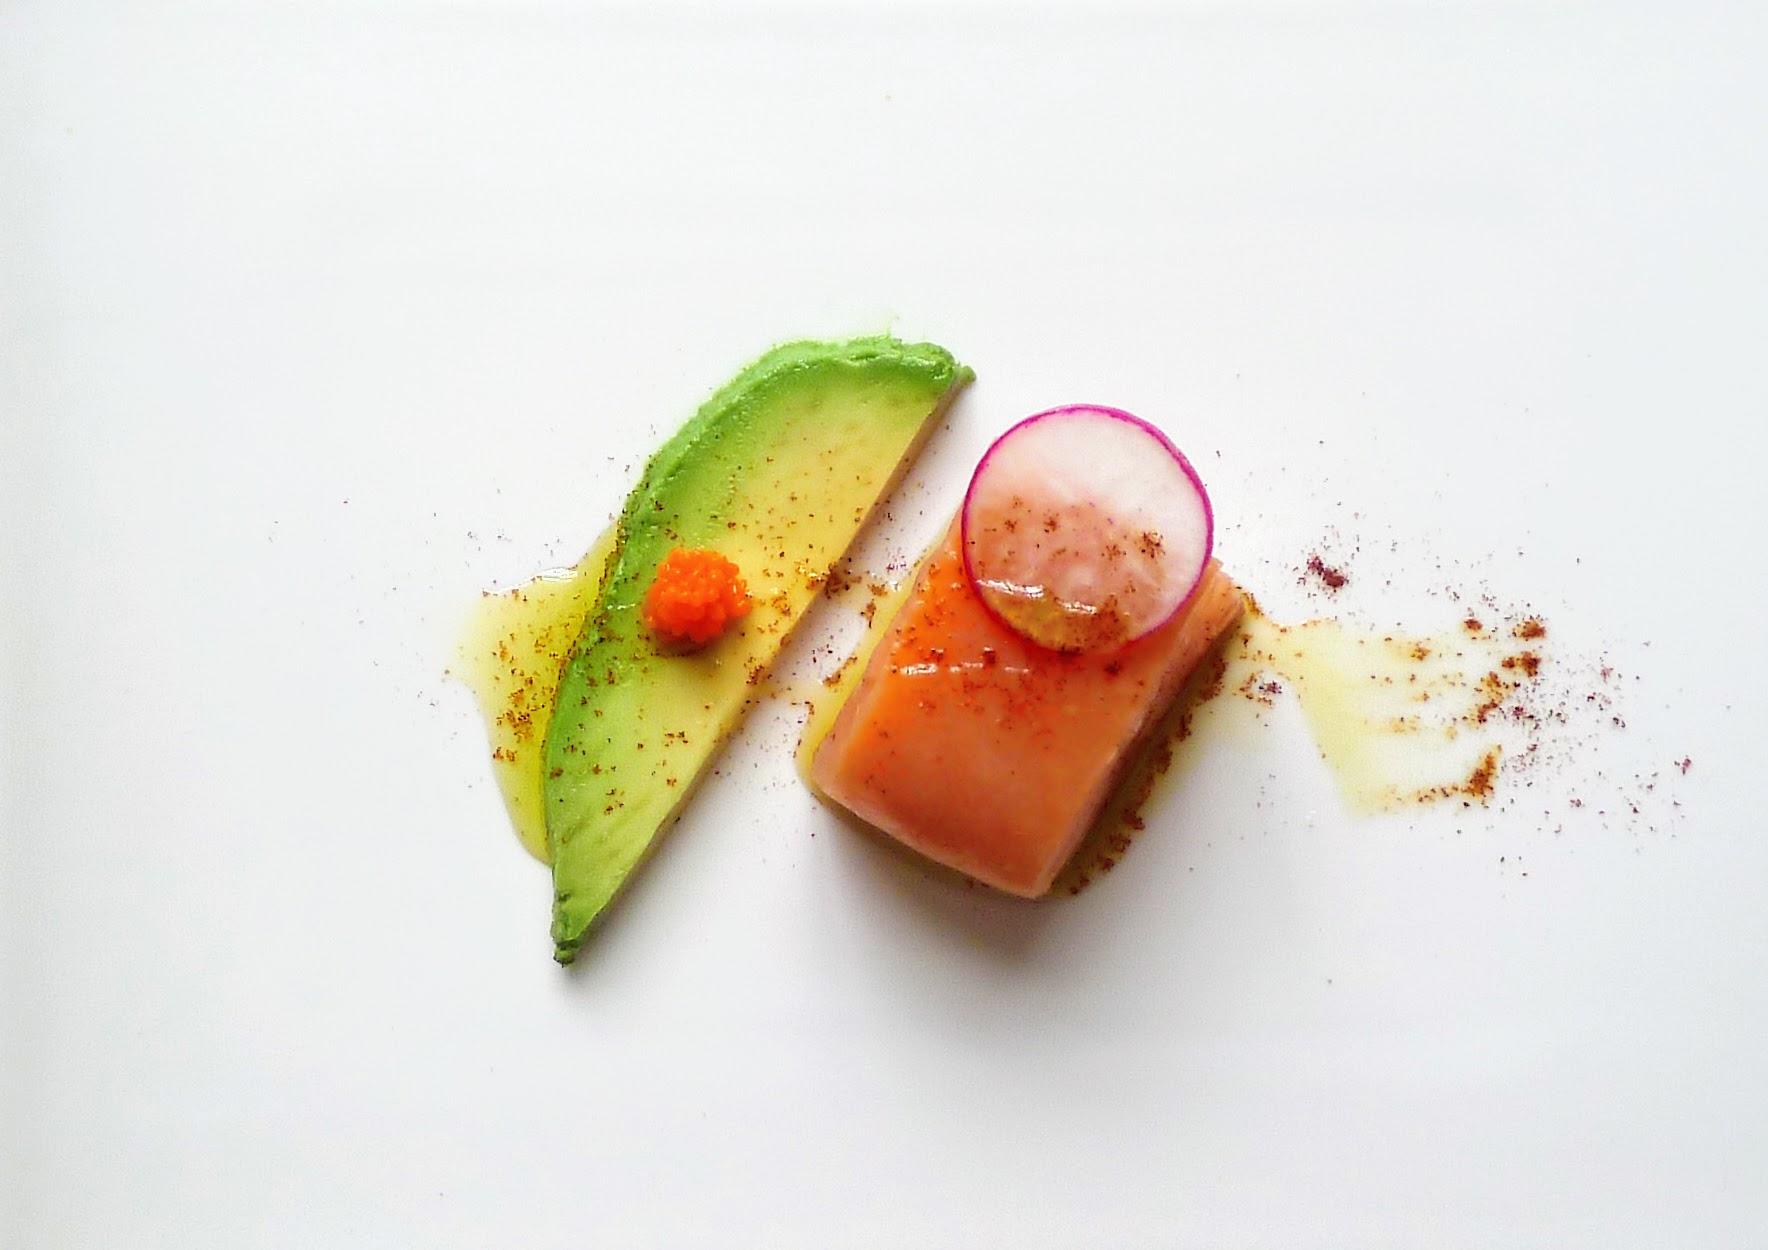 Sous vide Gravlax (Salmon) with avocado, Carrot caviar, radish, EVOO & Paprika